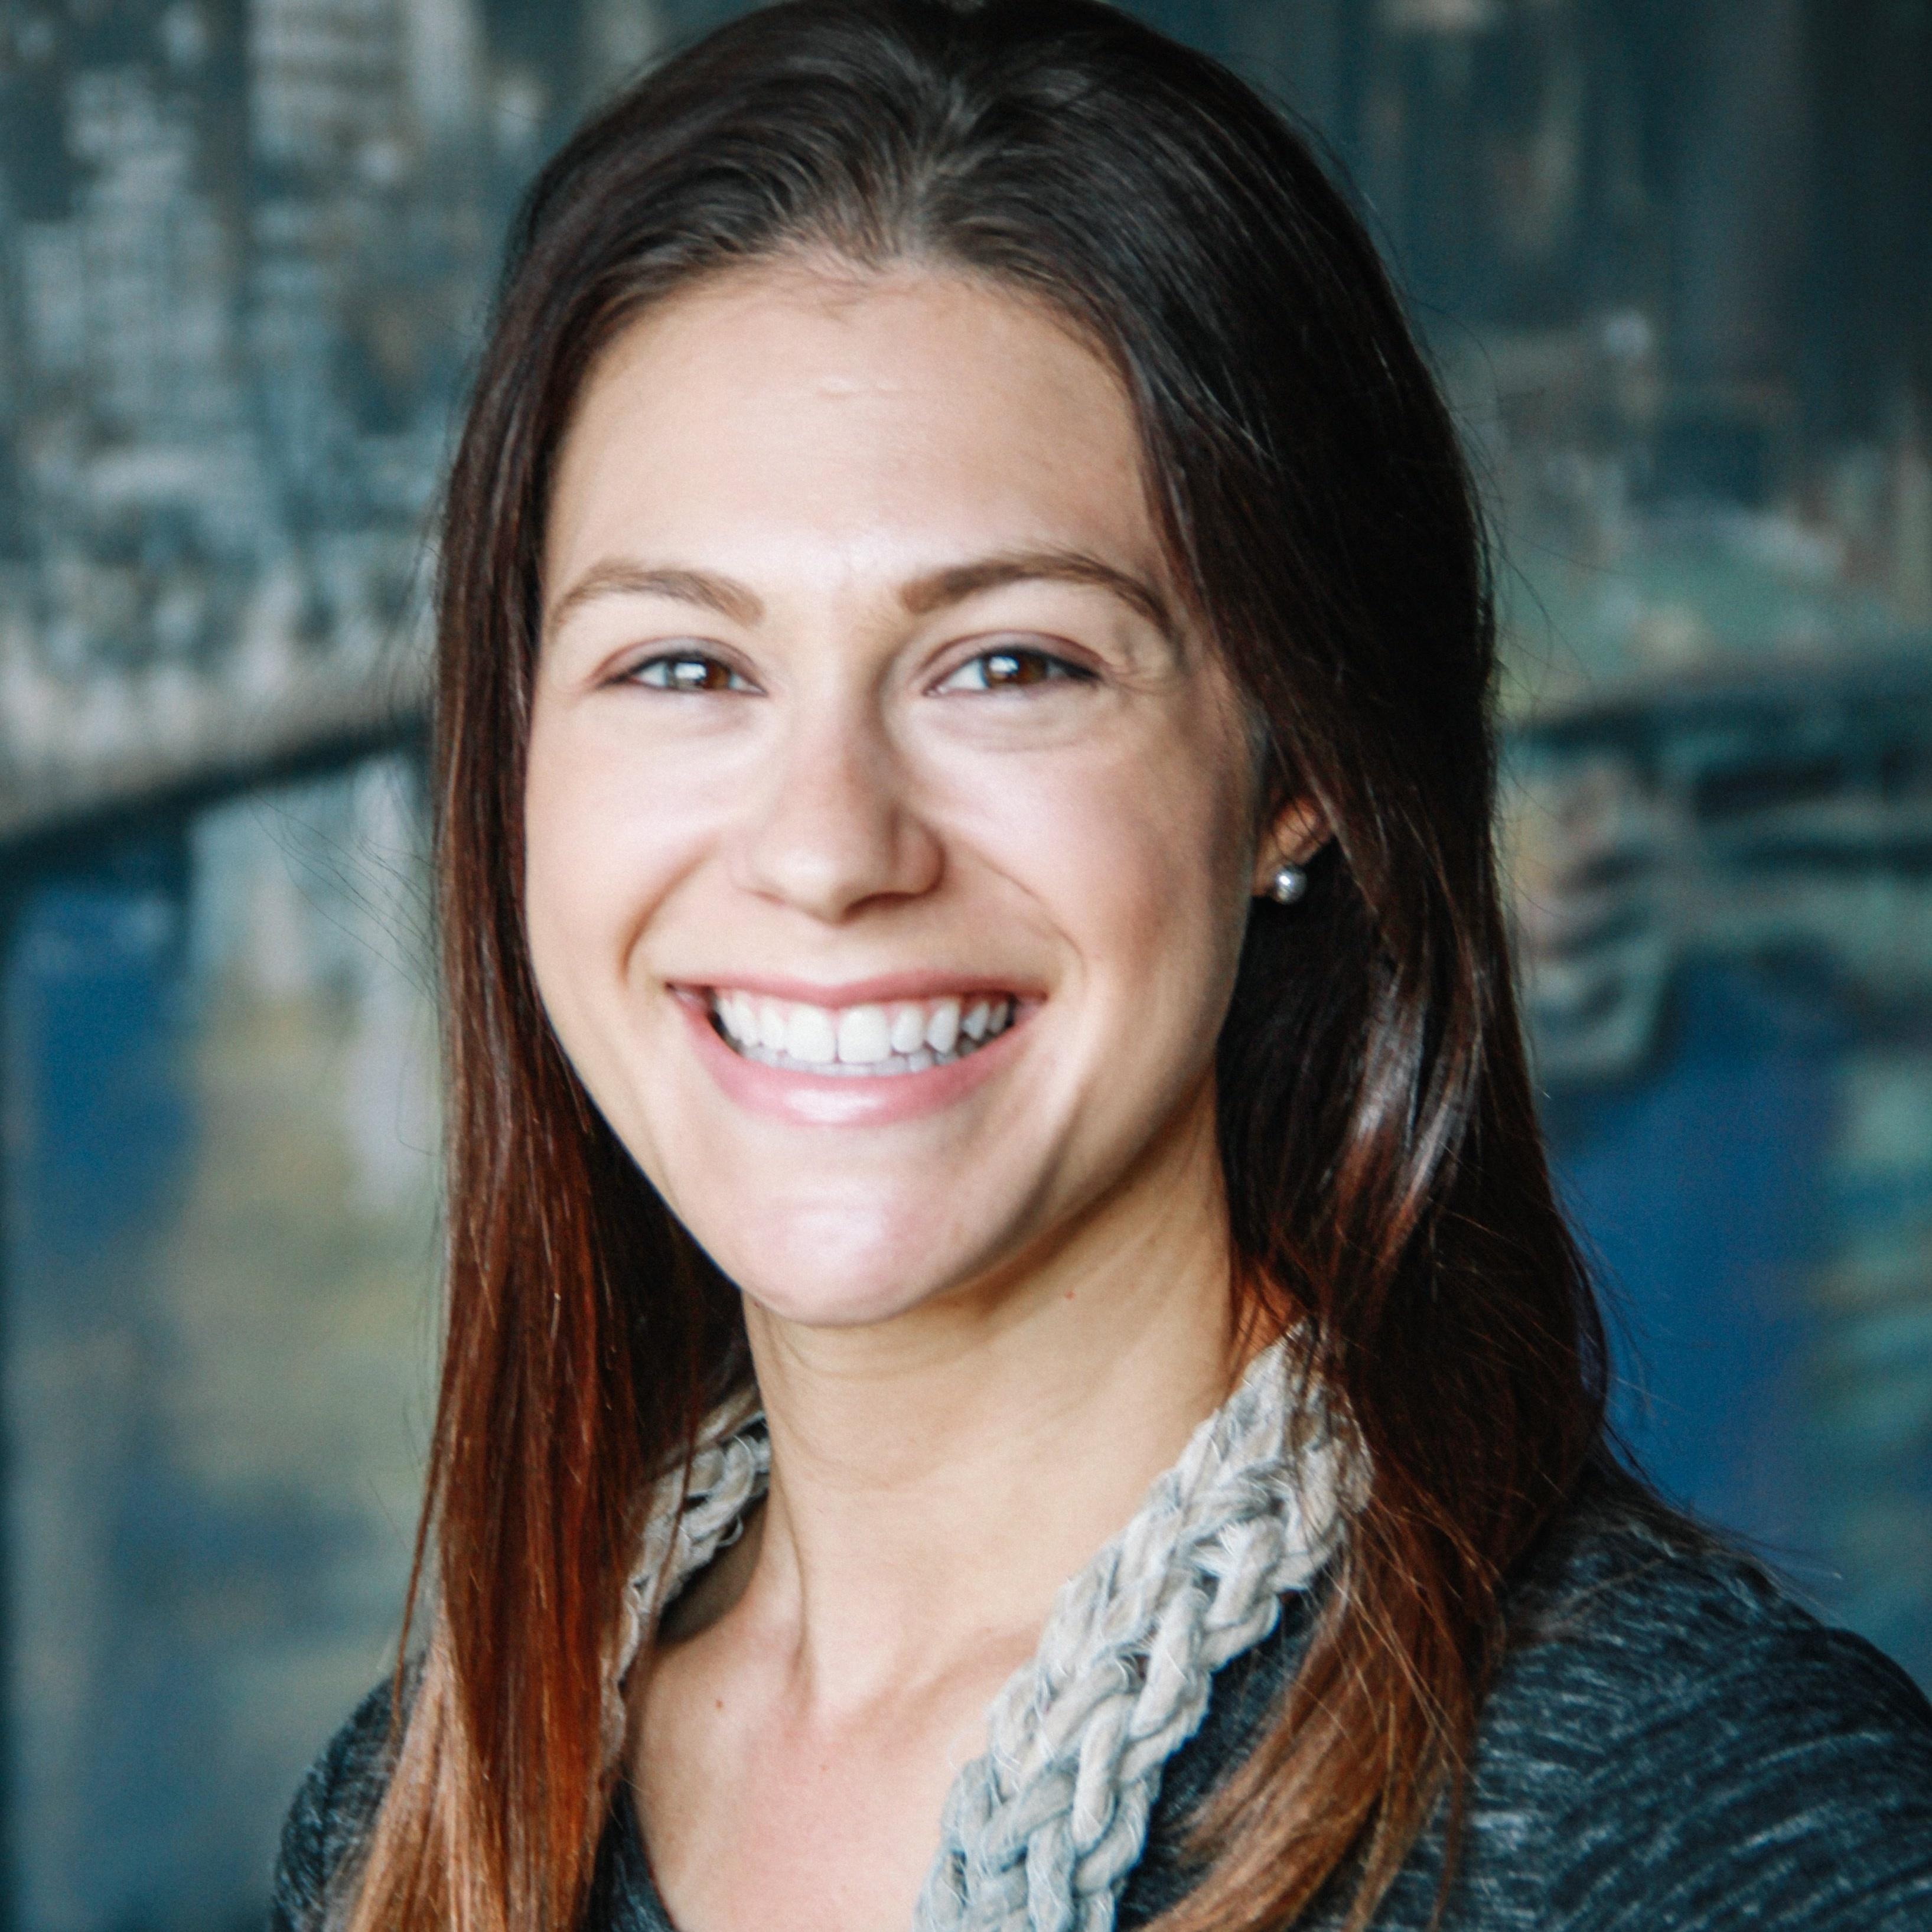 Megan Symens, Associate Account Strategist